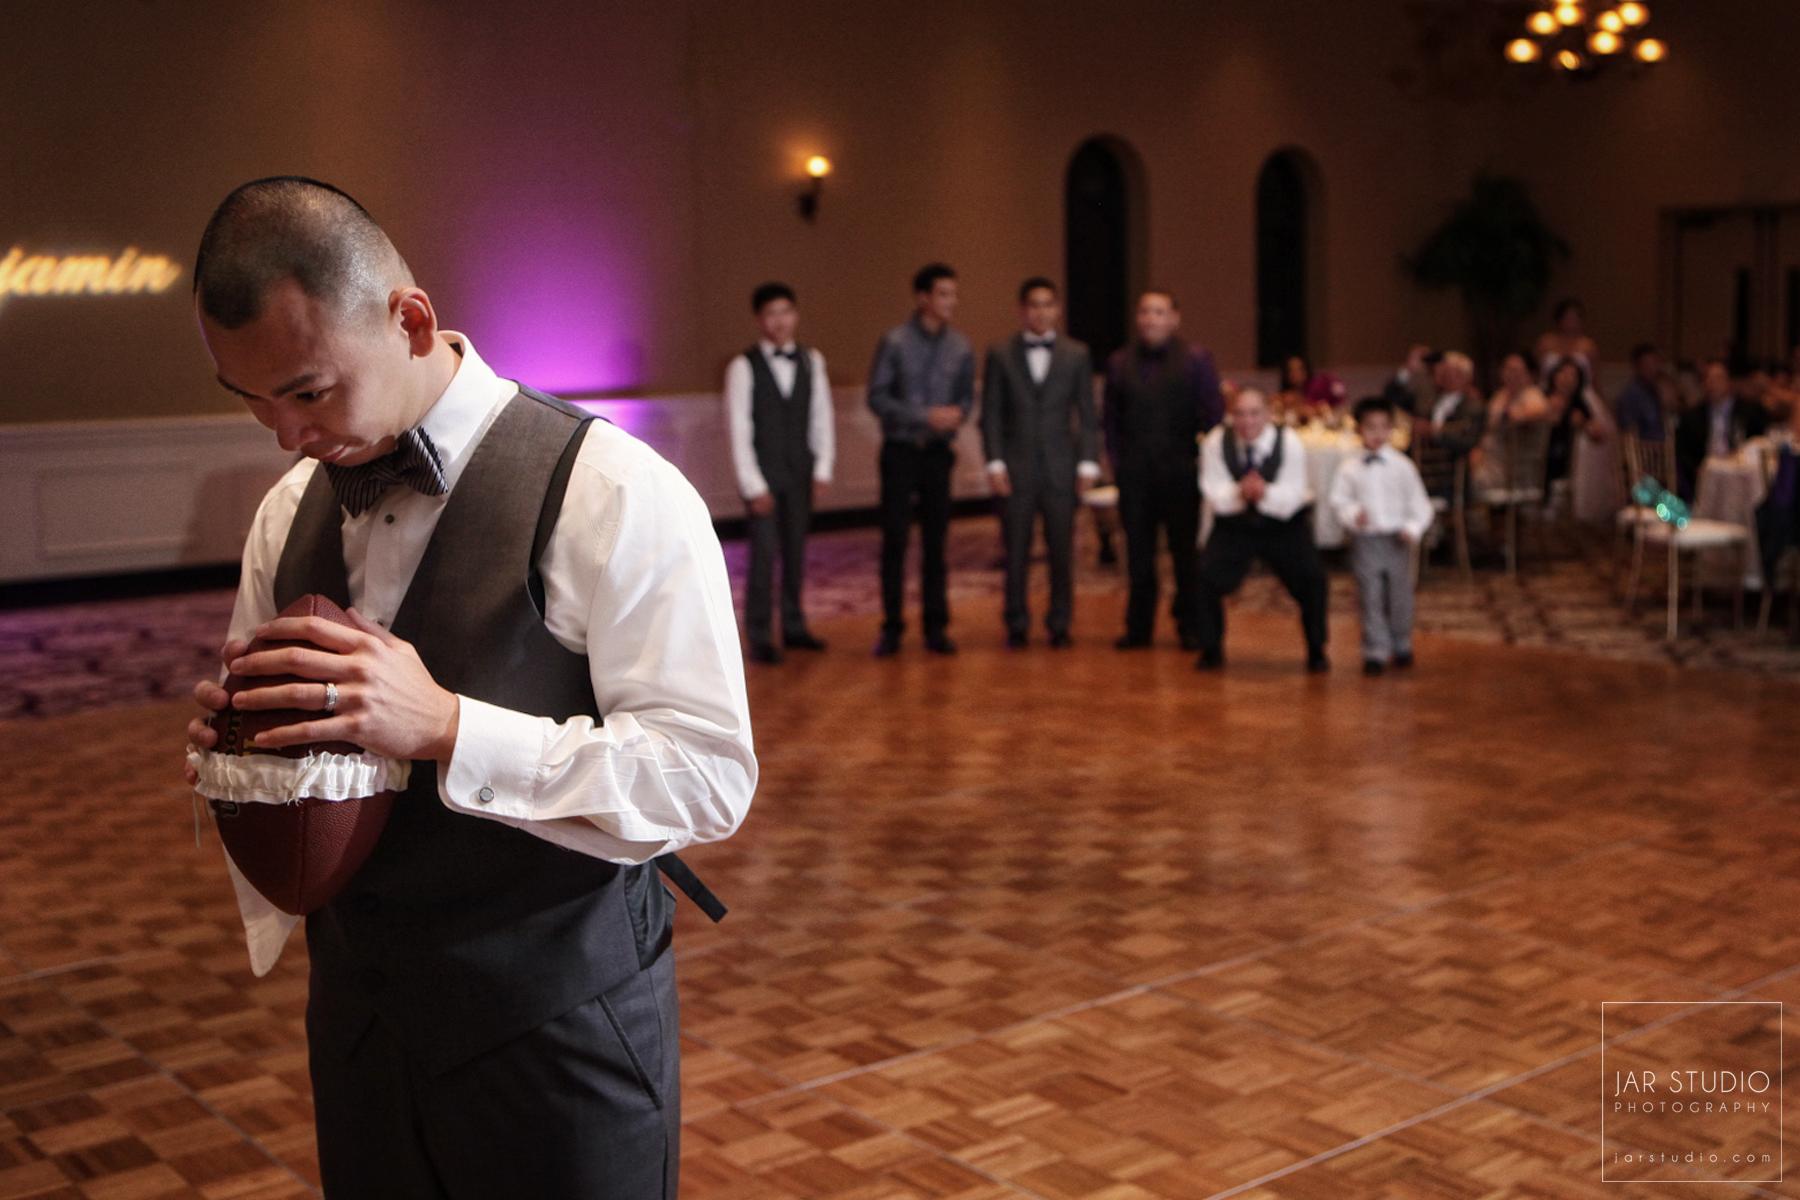 27-original-idea-football-garter-toss-orlando-wedding-photography.JPG